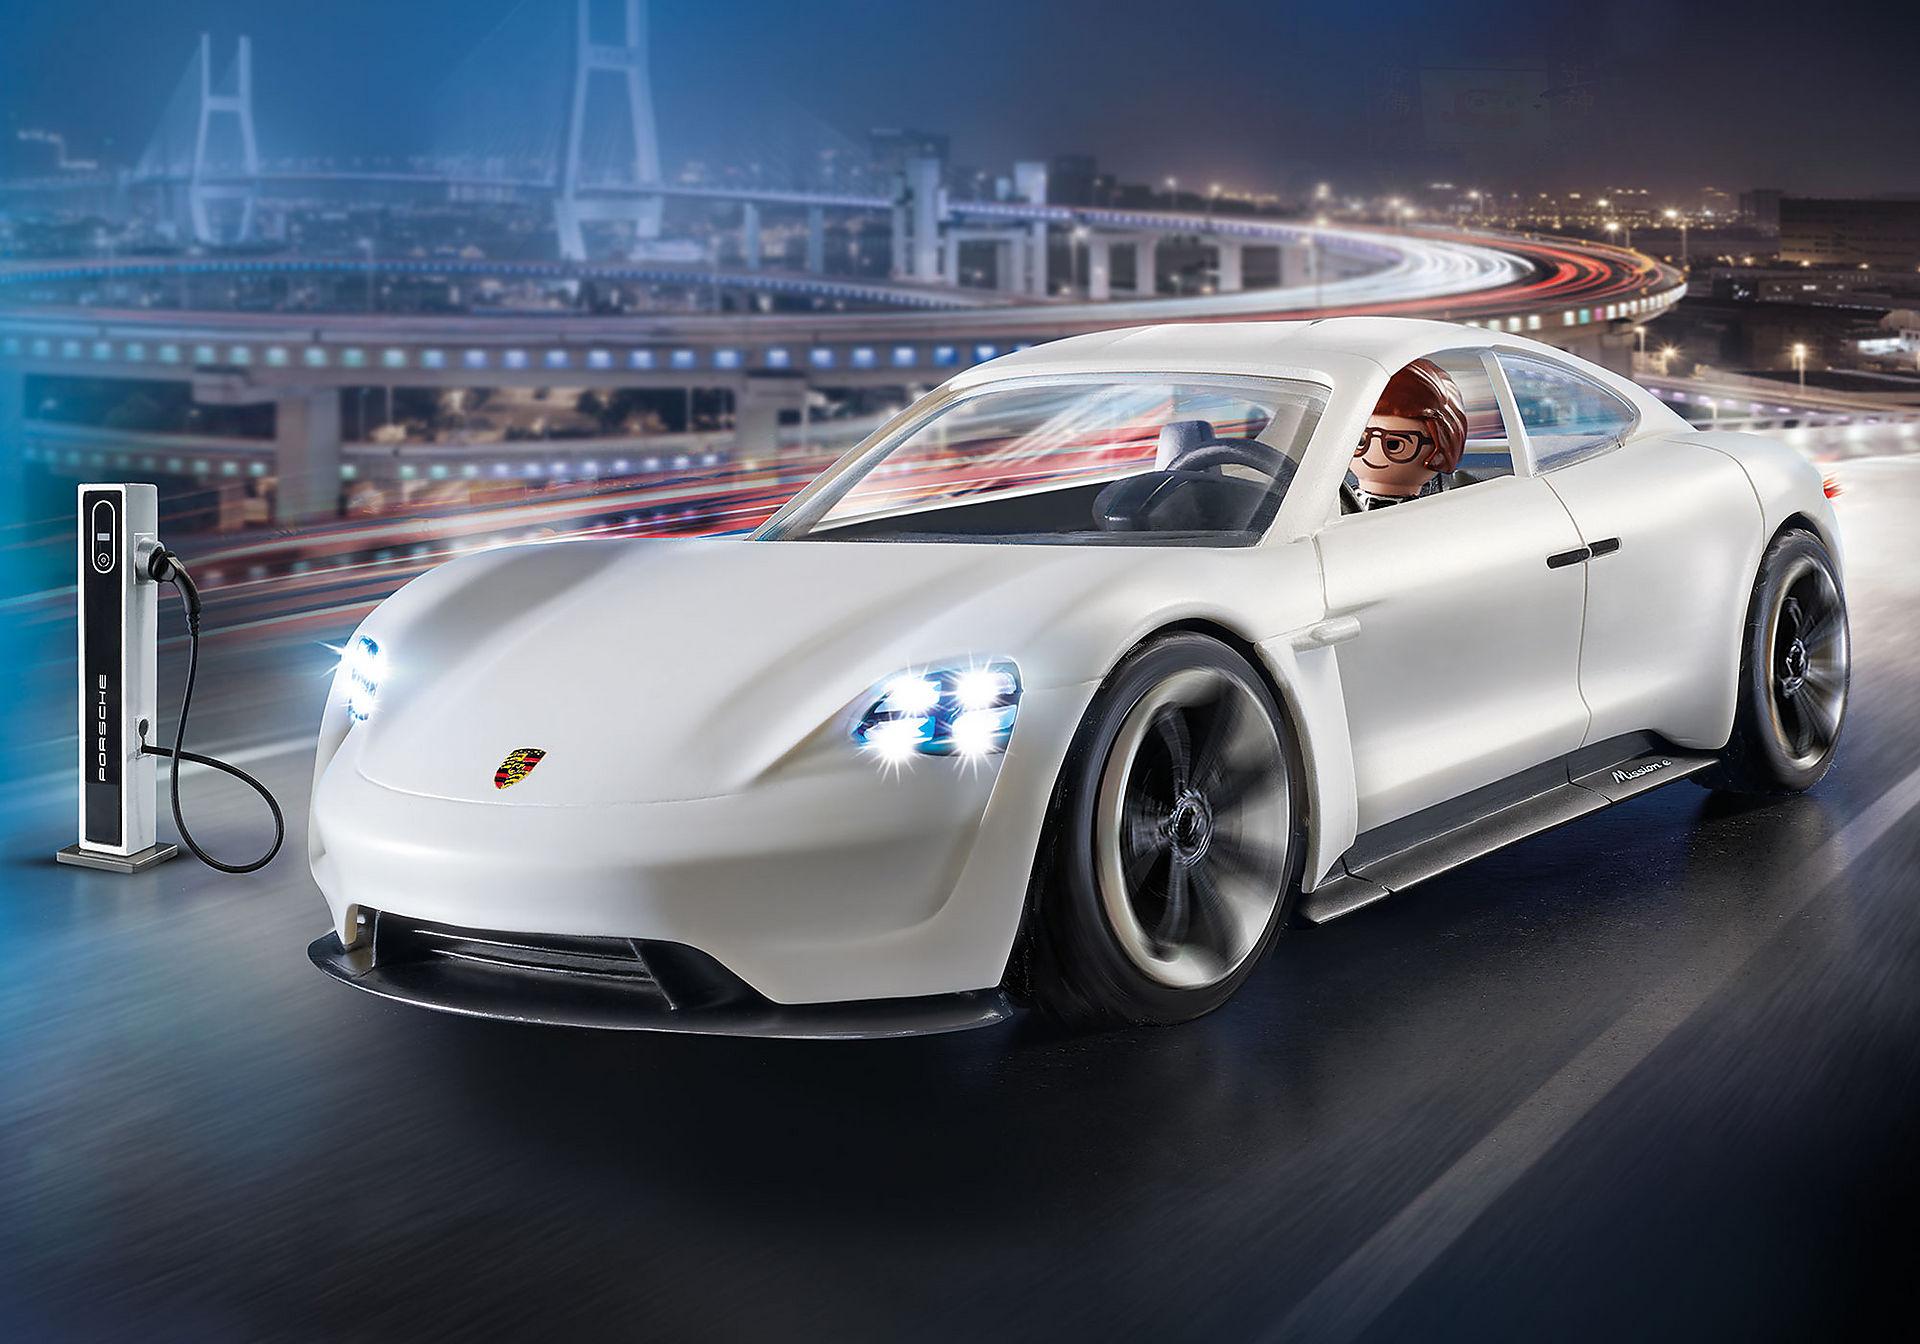 70078 PLAYMOBIL: THE MOVIE Rex Dasher's Porsche Mission E zoom image1